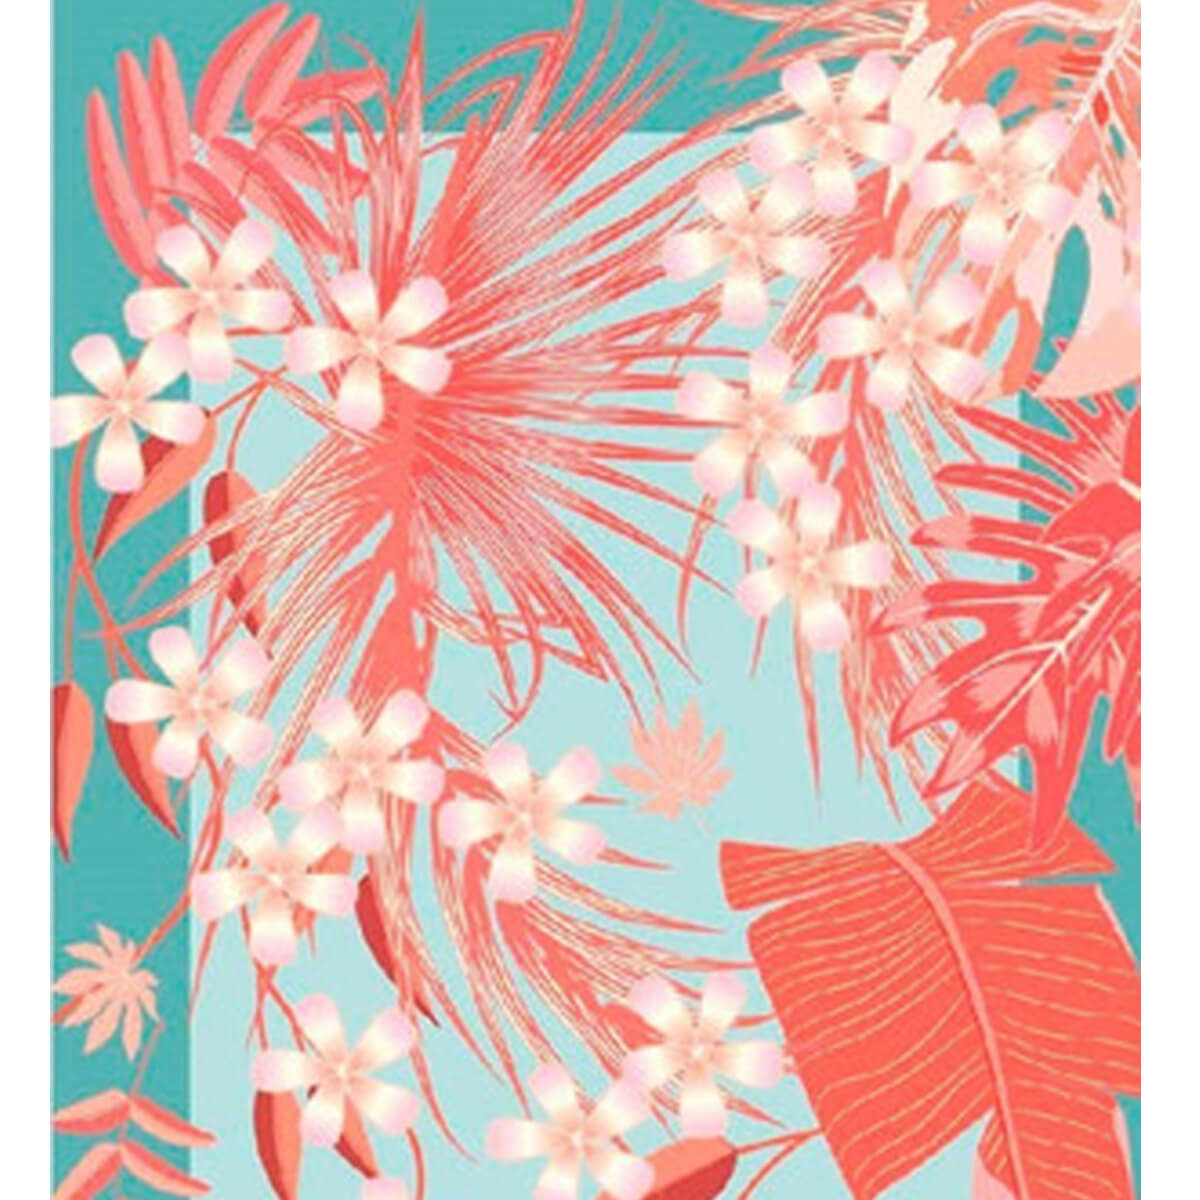 Toalha de Praia Aveludada Vereda Floral